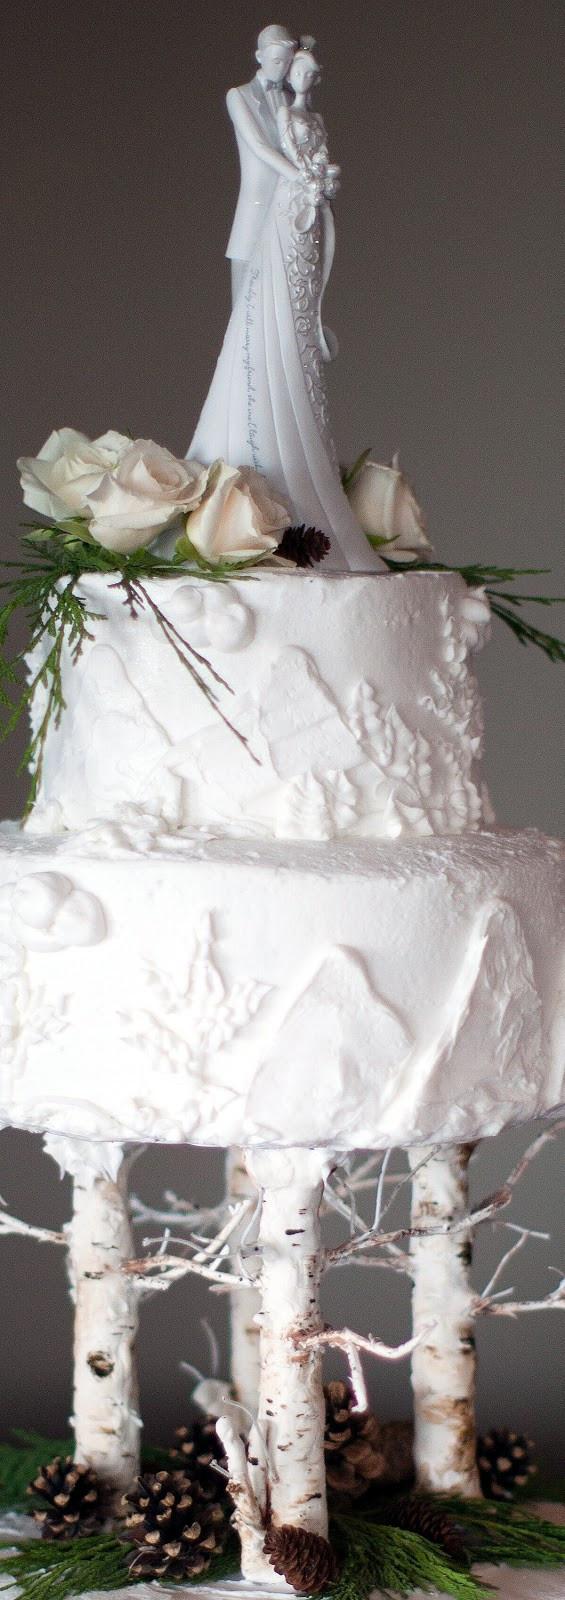 King Soopers Wedding Cakes  King soopers wedding cakes idea in 2017